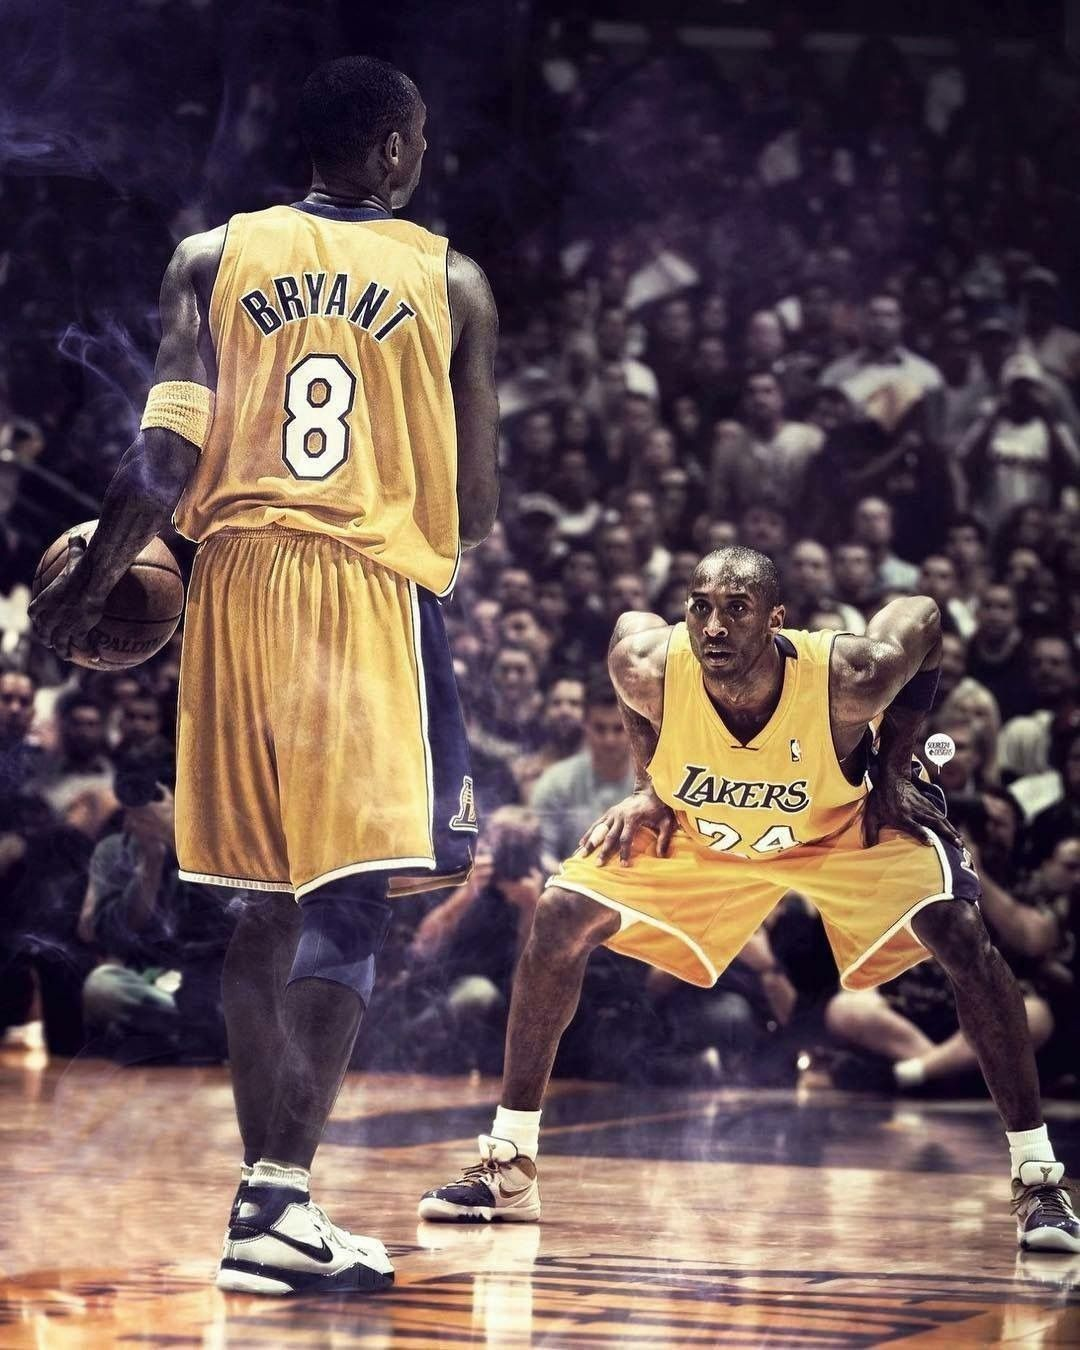 8 vs 24 | Basketball | Lakers kobe, Kobe bryant nba, Kobe bryant 8